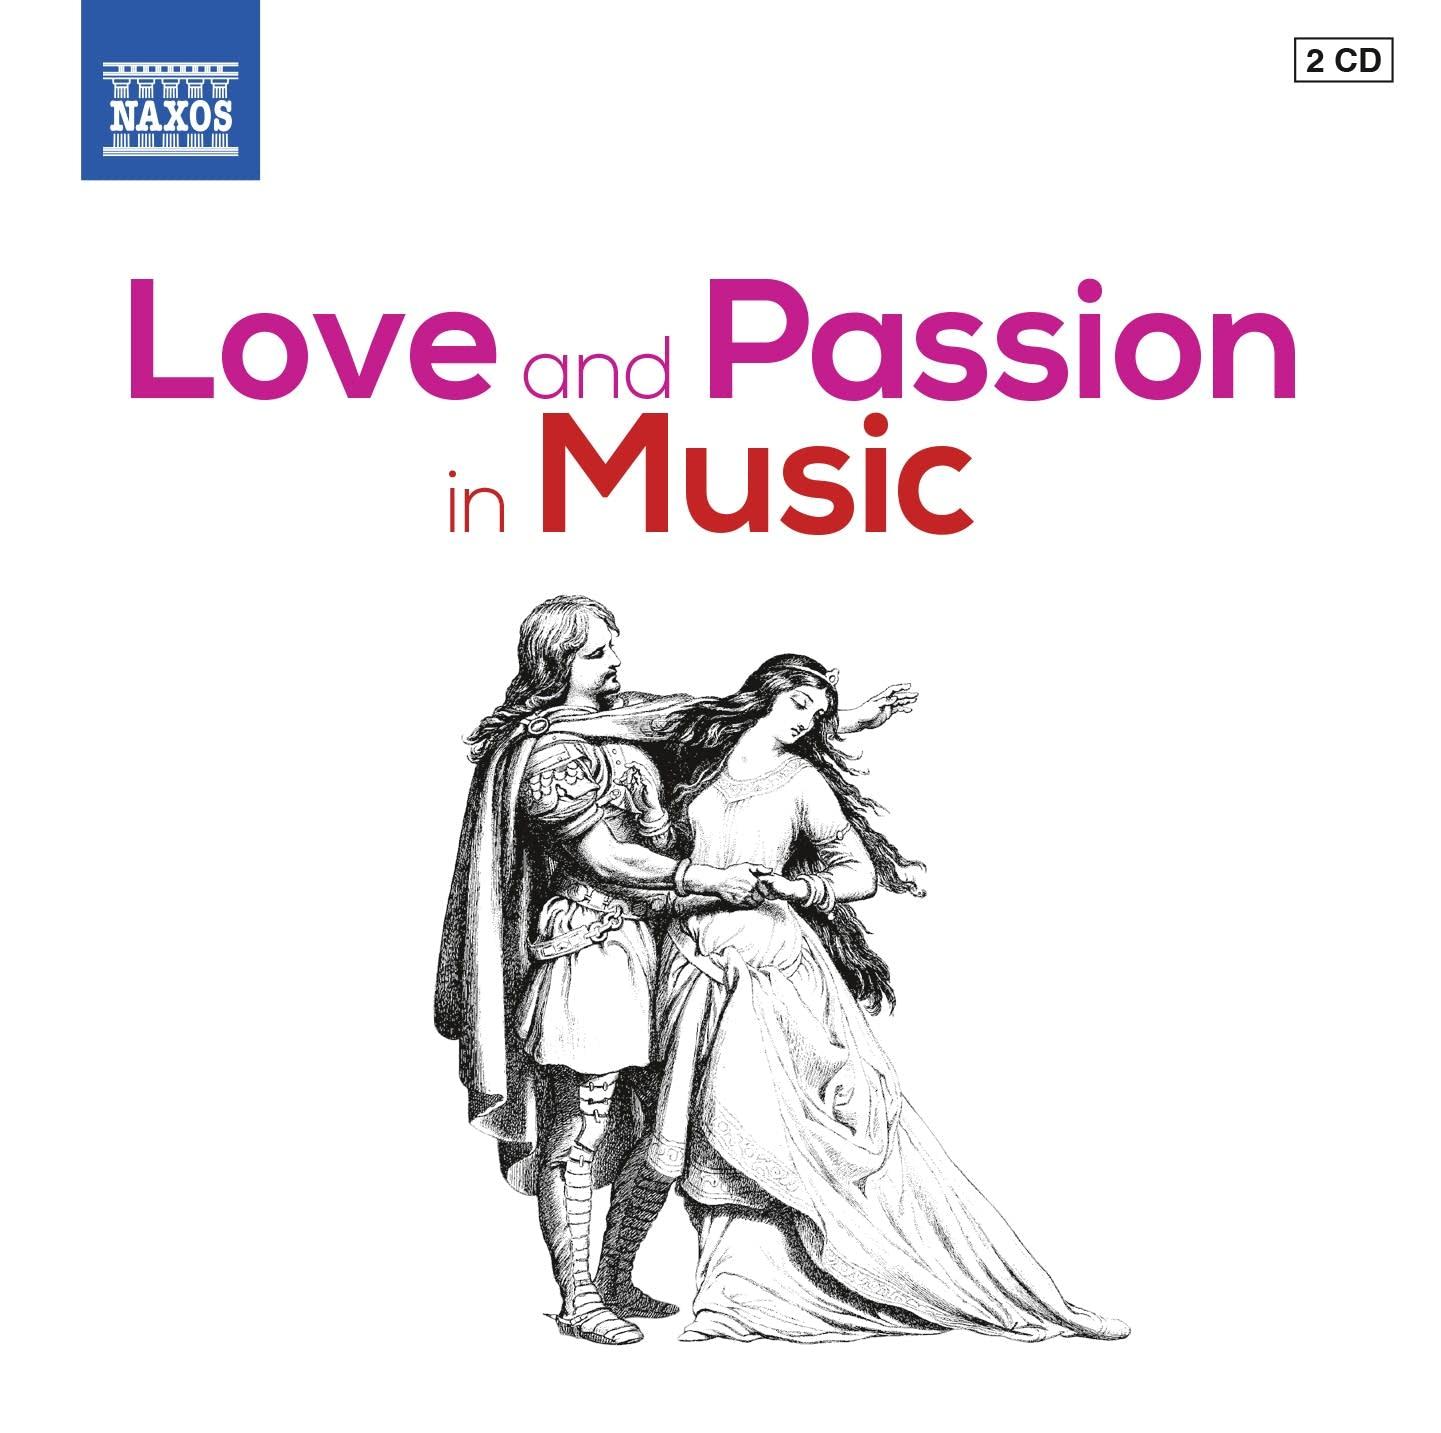 Peter Tchaikovsky - Sleeping Beauty: Adagio of the rose